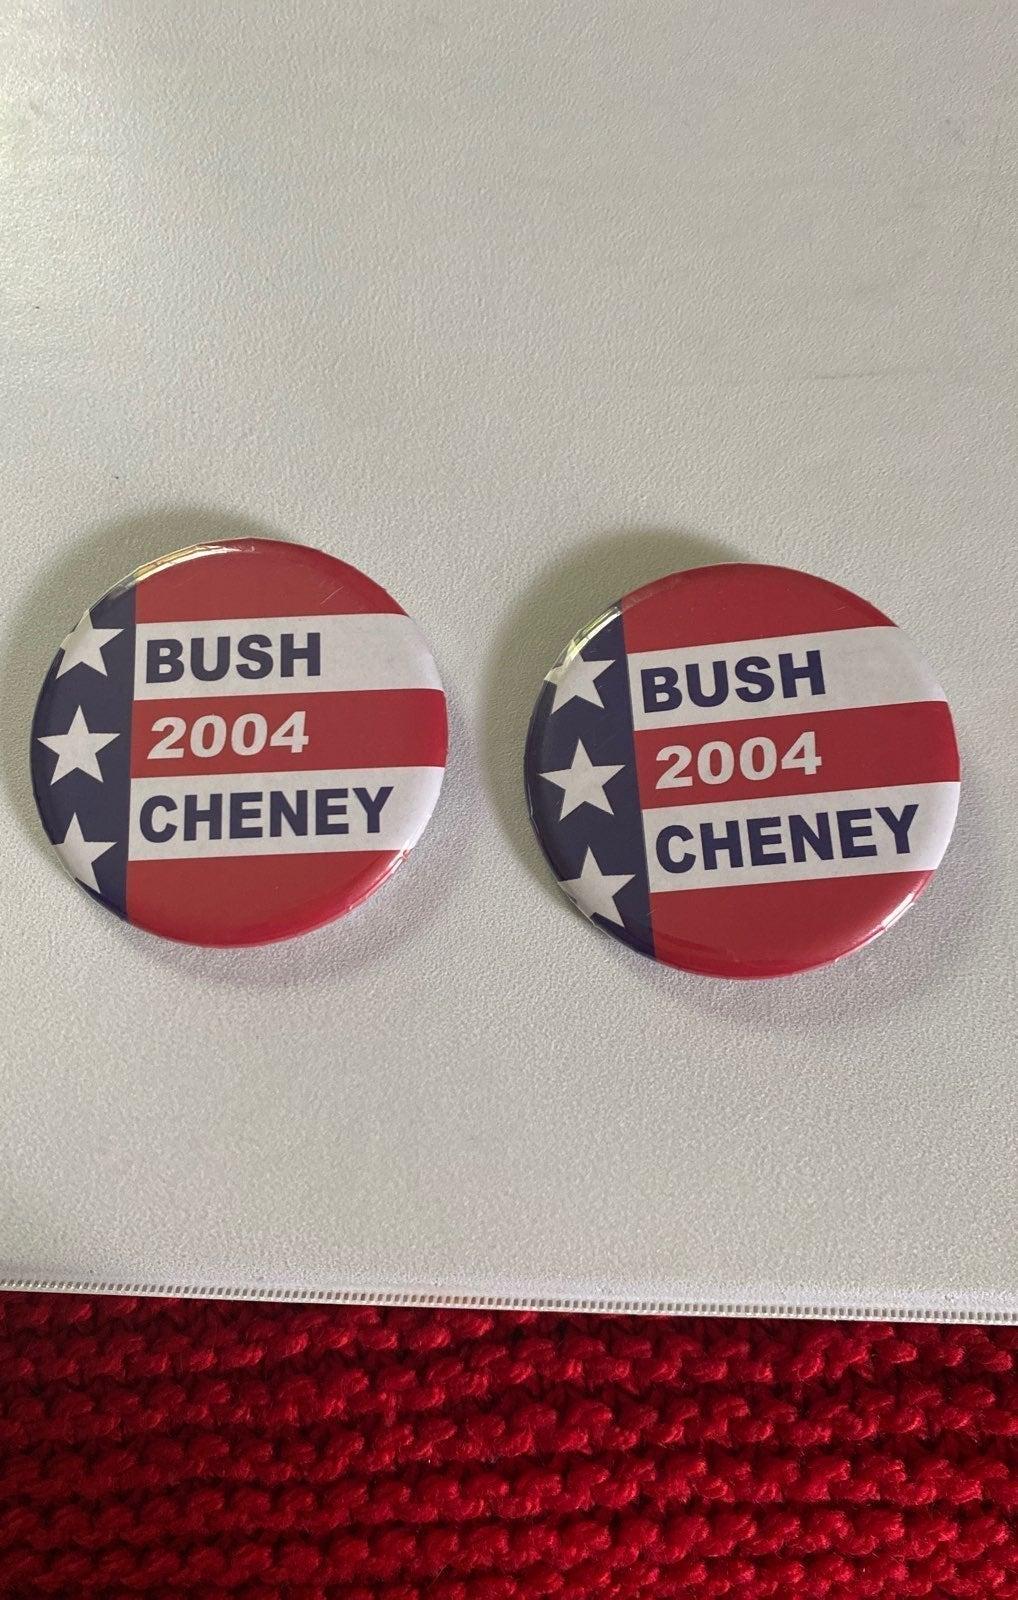 Bush Chaney buttons